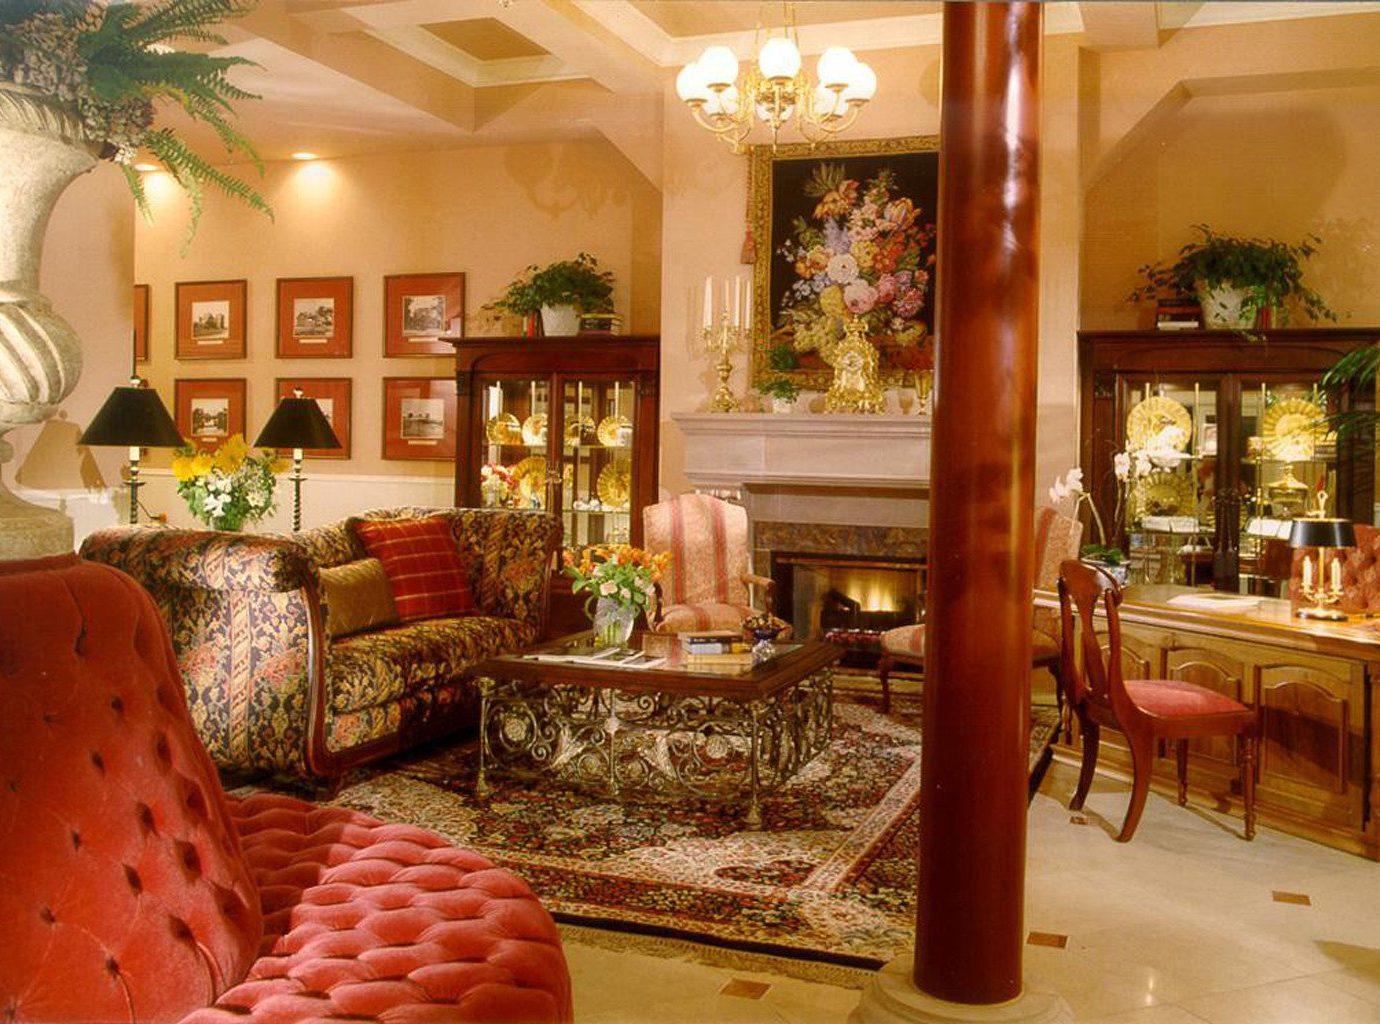 Cultural Historic Landmarks Lobby Lounge Romance Romantic Wine-Tasting living room chair home mansion